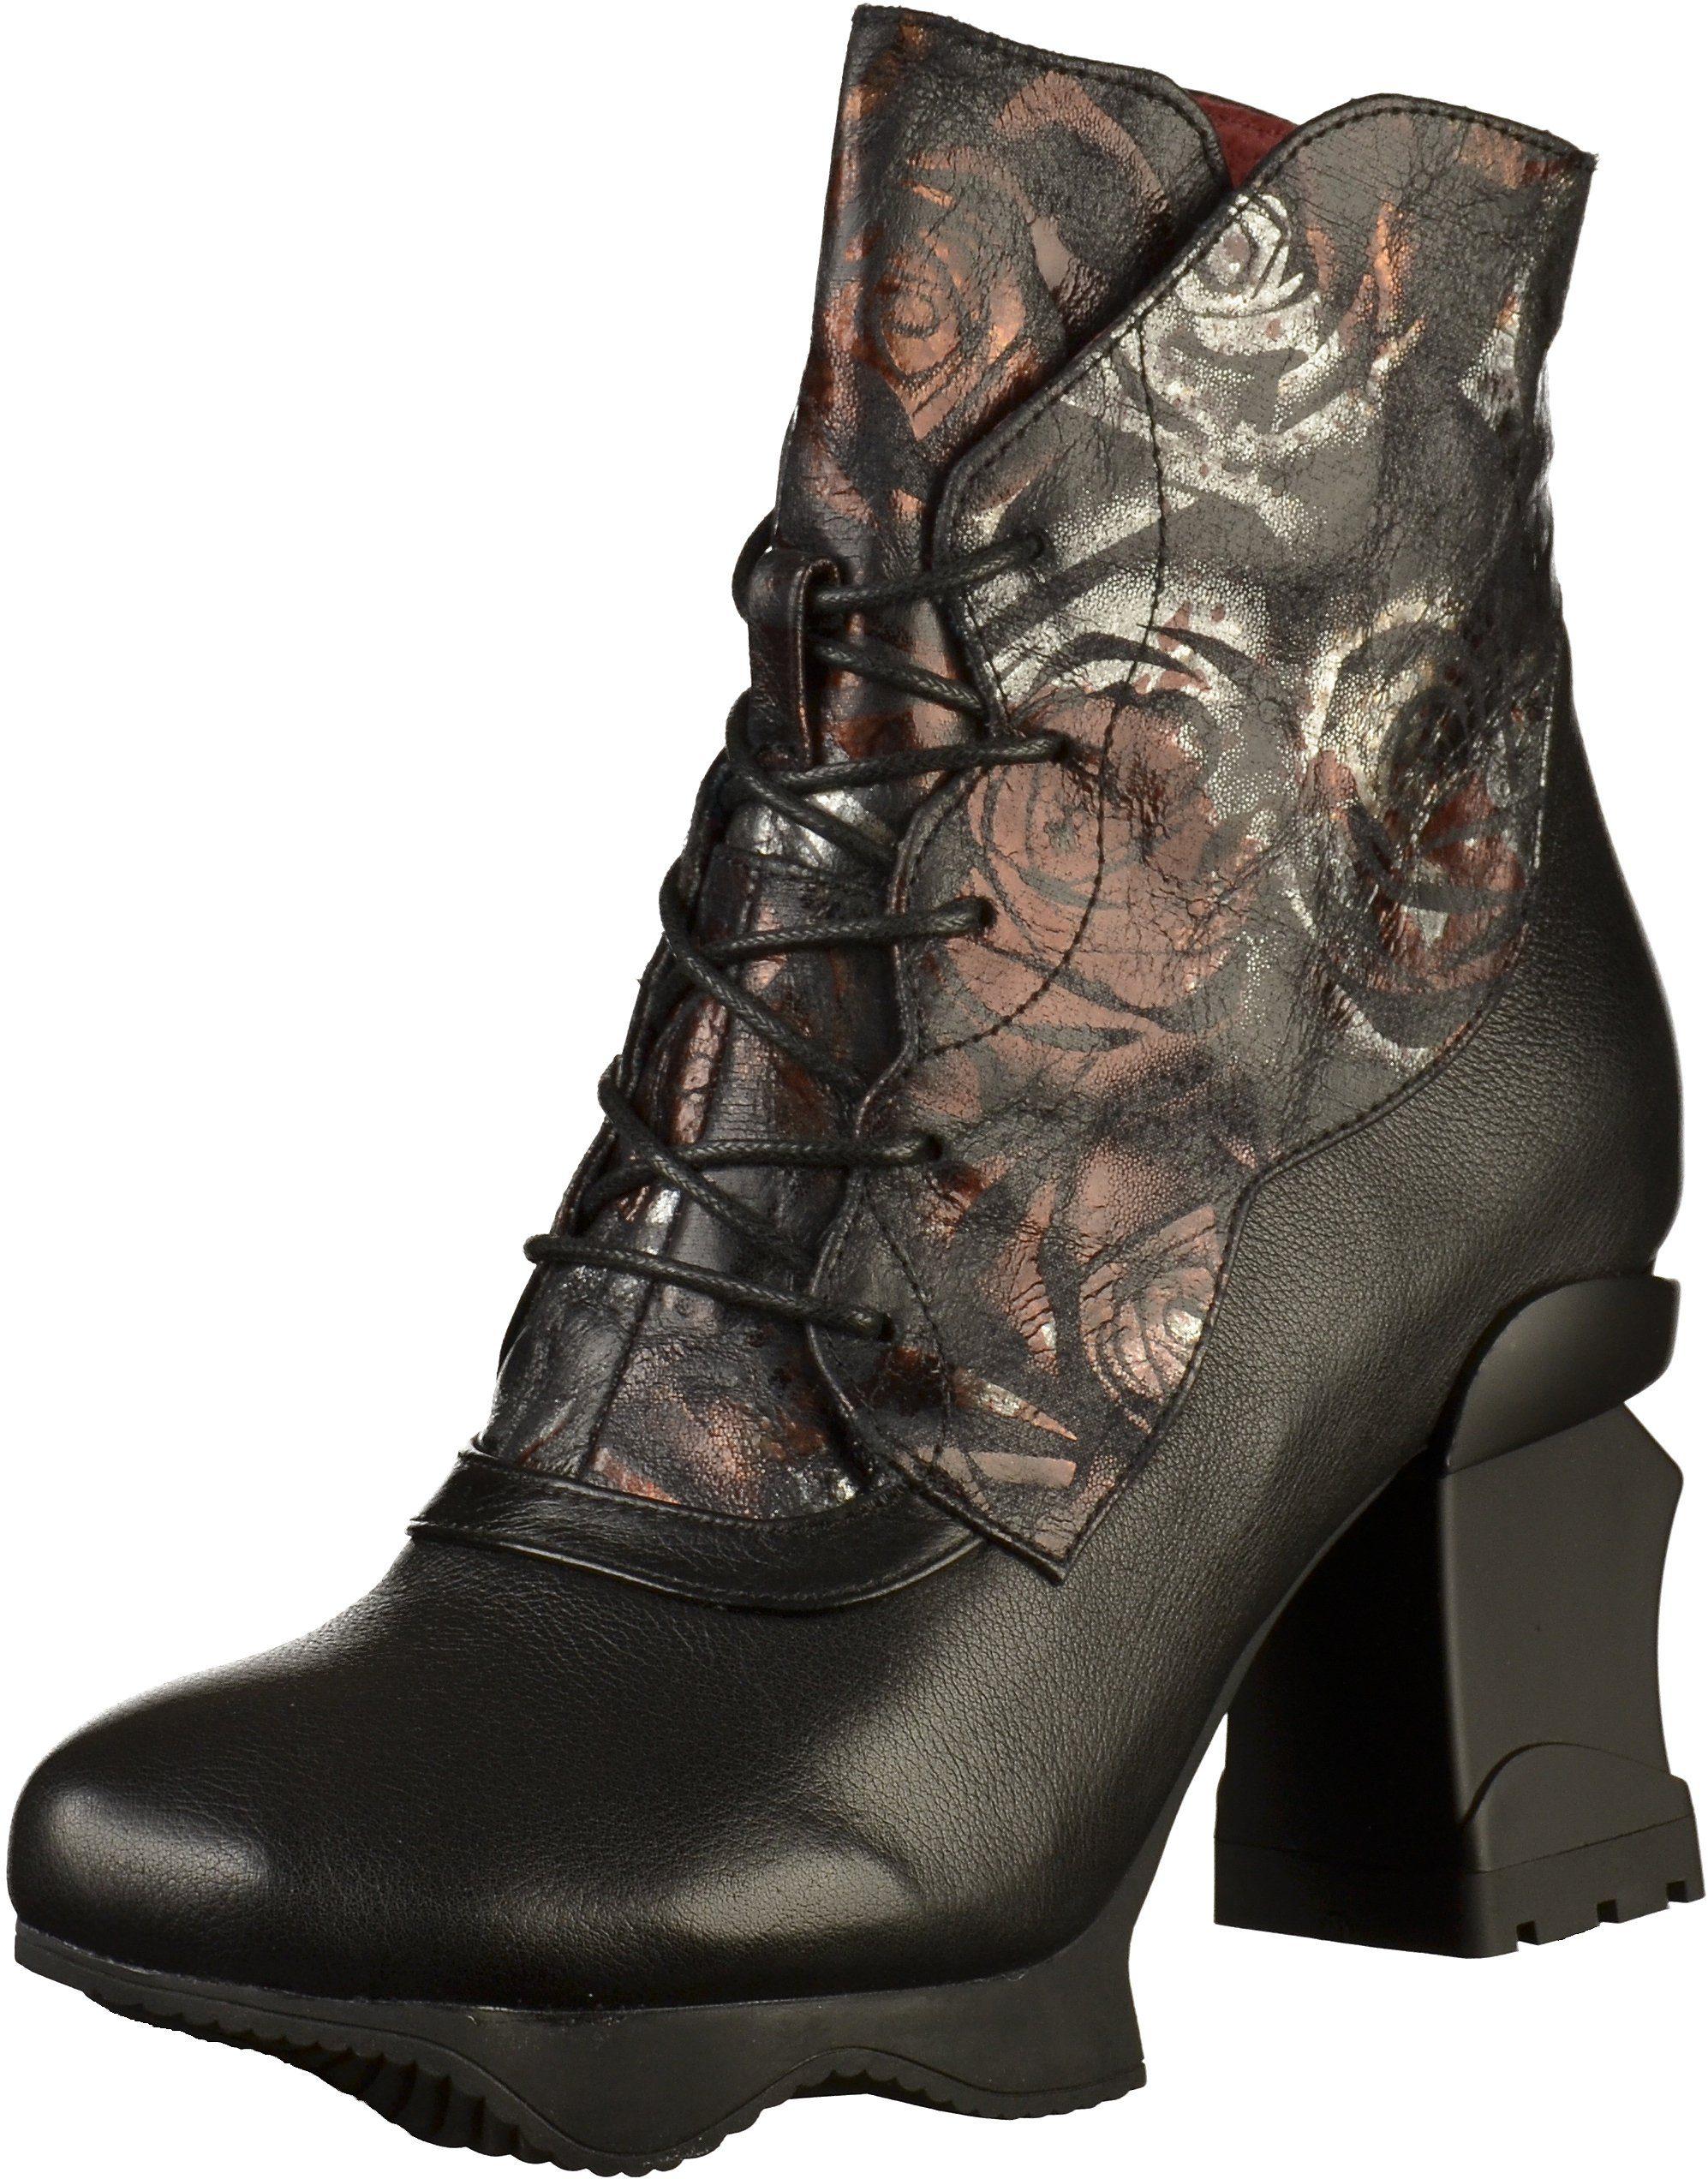 laura vita -  High-Heel-Stiefelette Leder/Textil